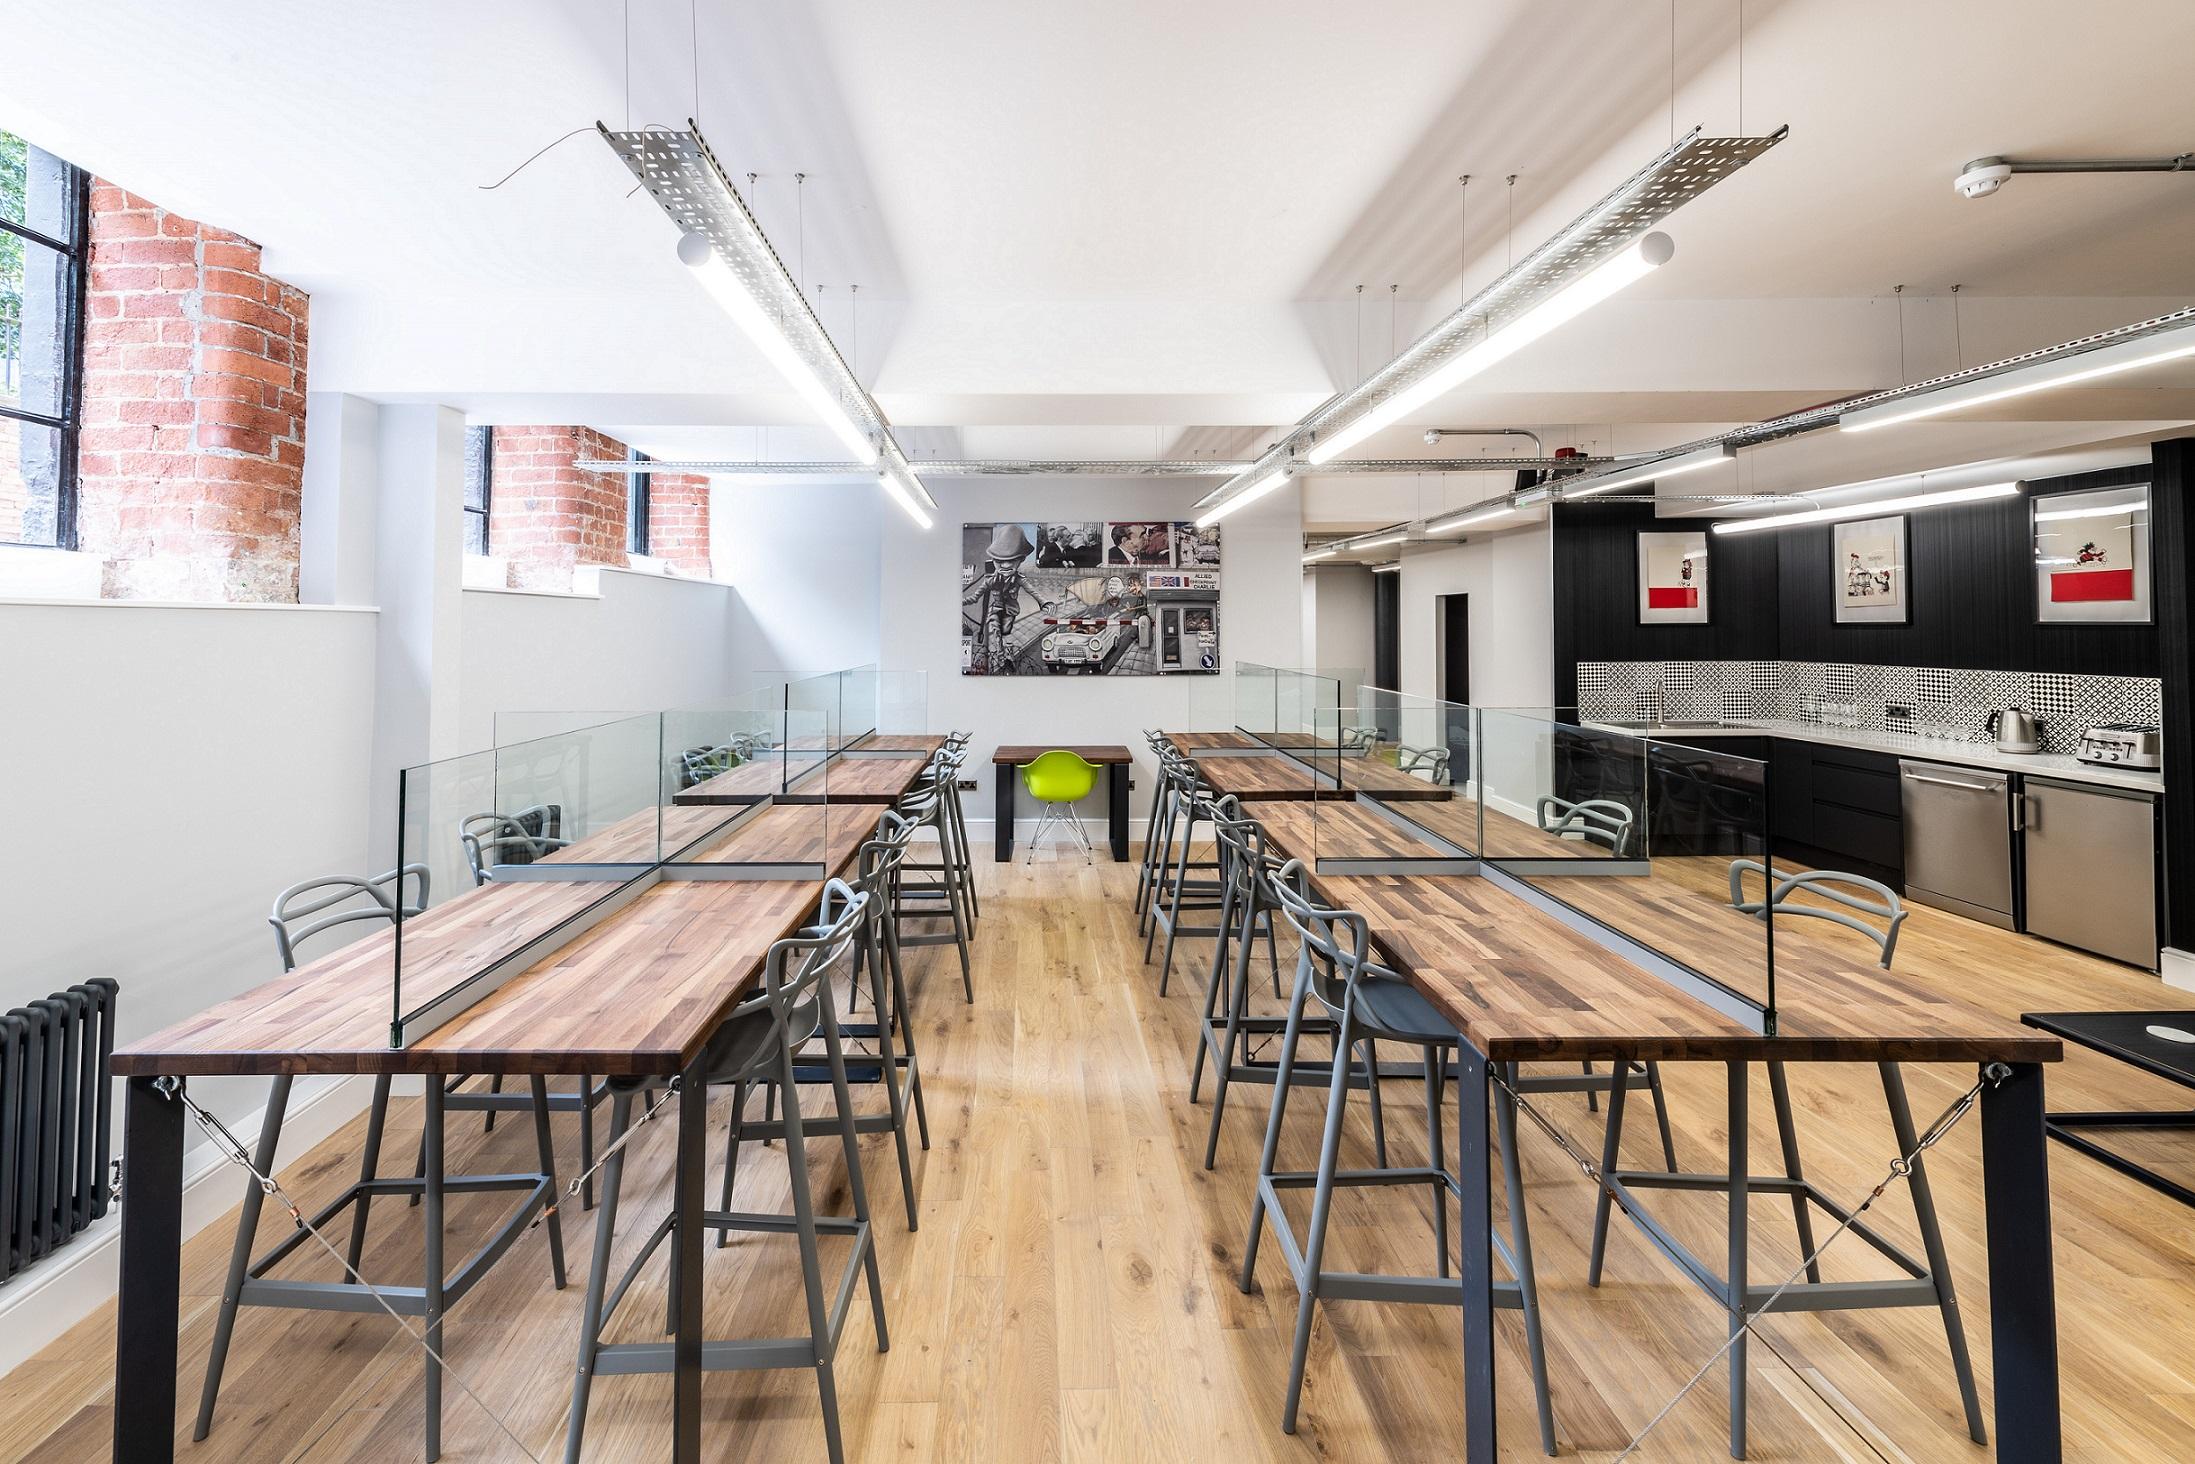 Introducing Nottingham's post-COVID way of working - Creative Quarter welcomes new £5 million hotdesking hub